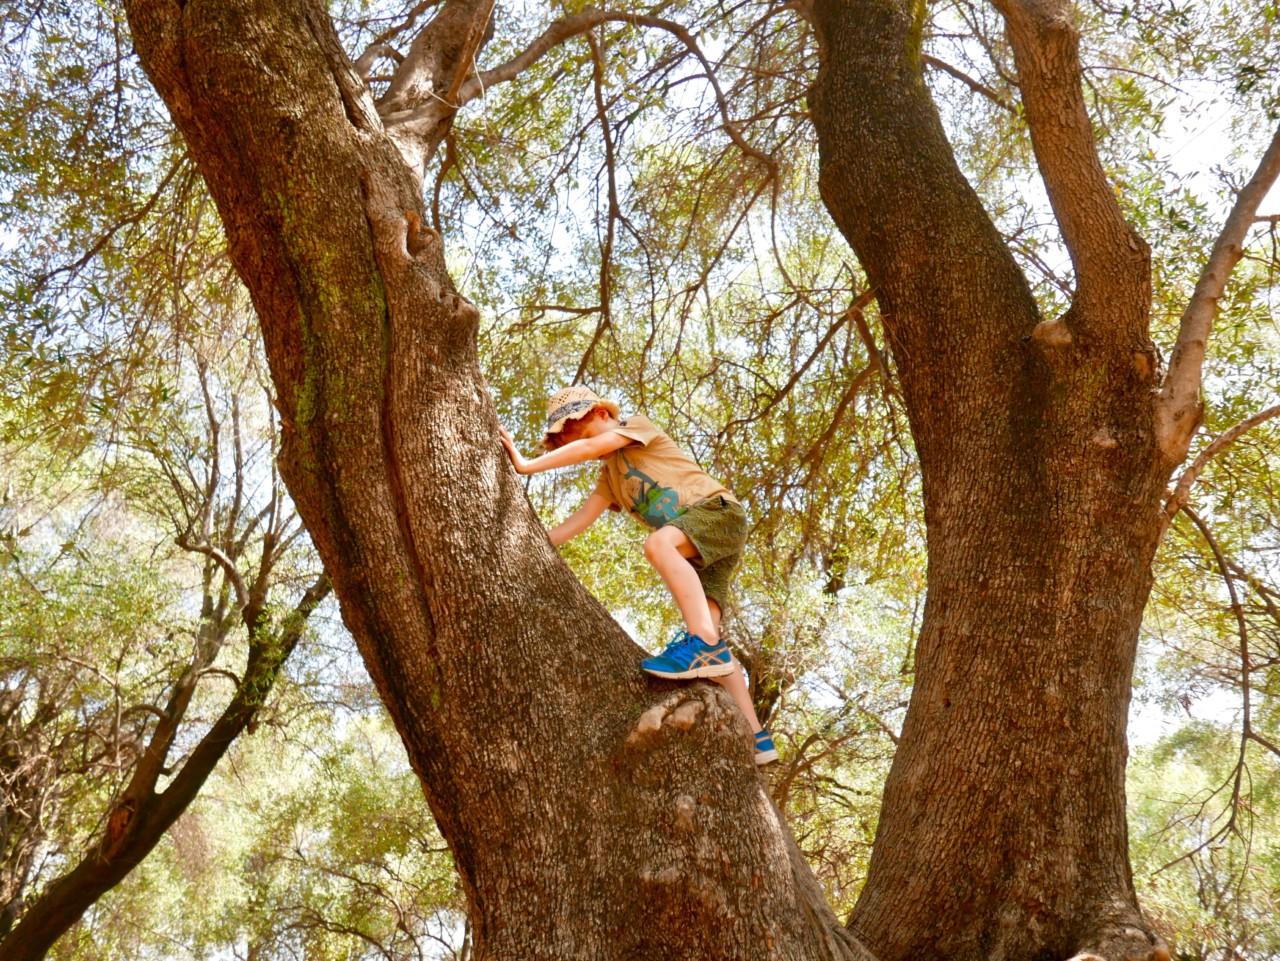 kids-climbing-olive-trees-parc-du-pian-menton